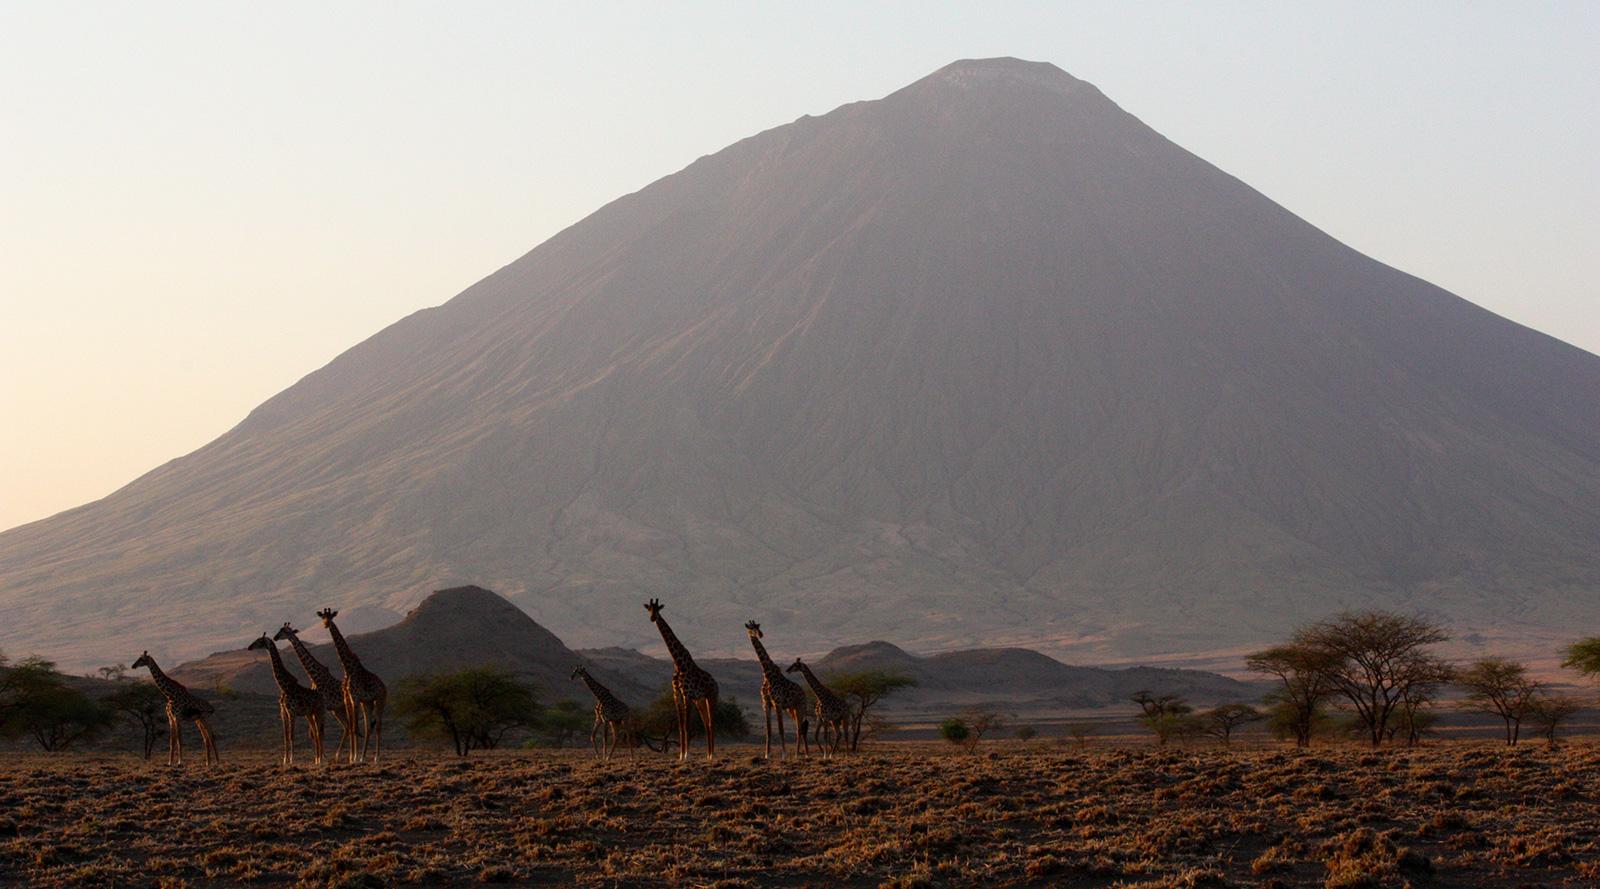 © Benedetta Mazzini | Ol Doinyo Lengai, Tanzania